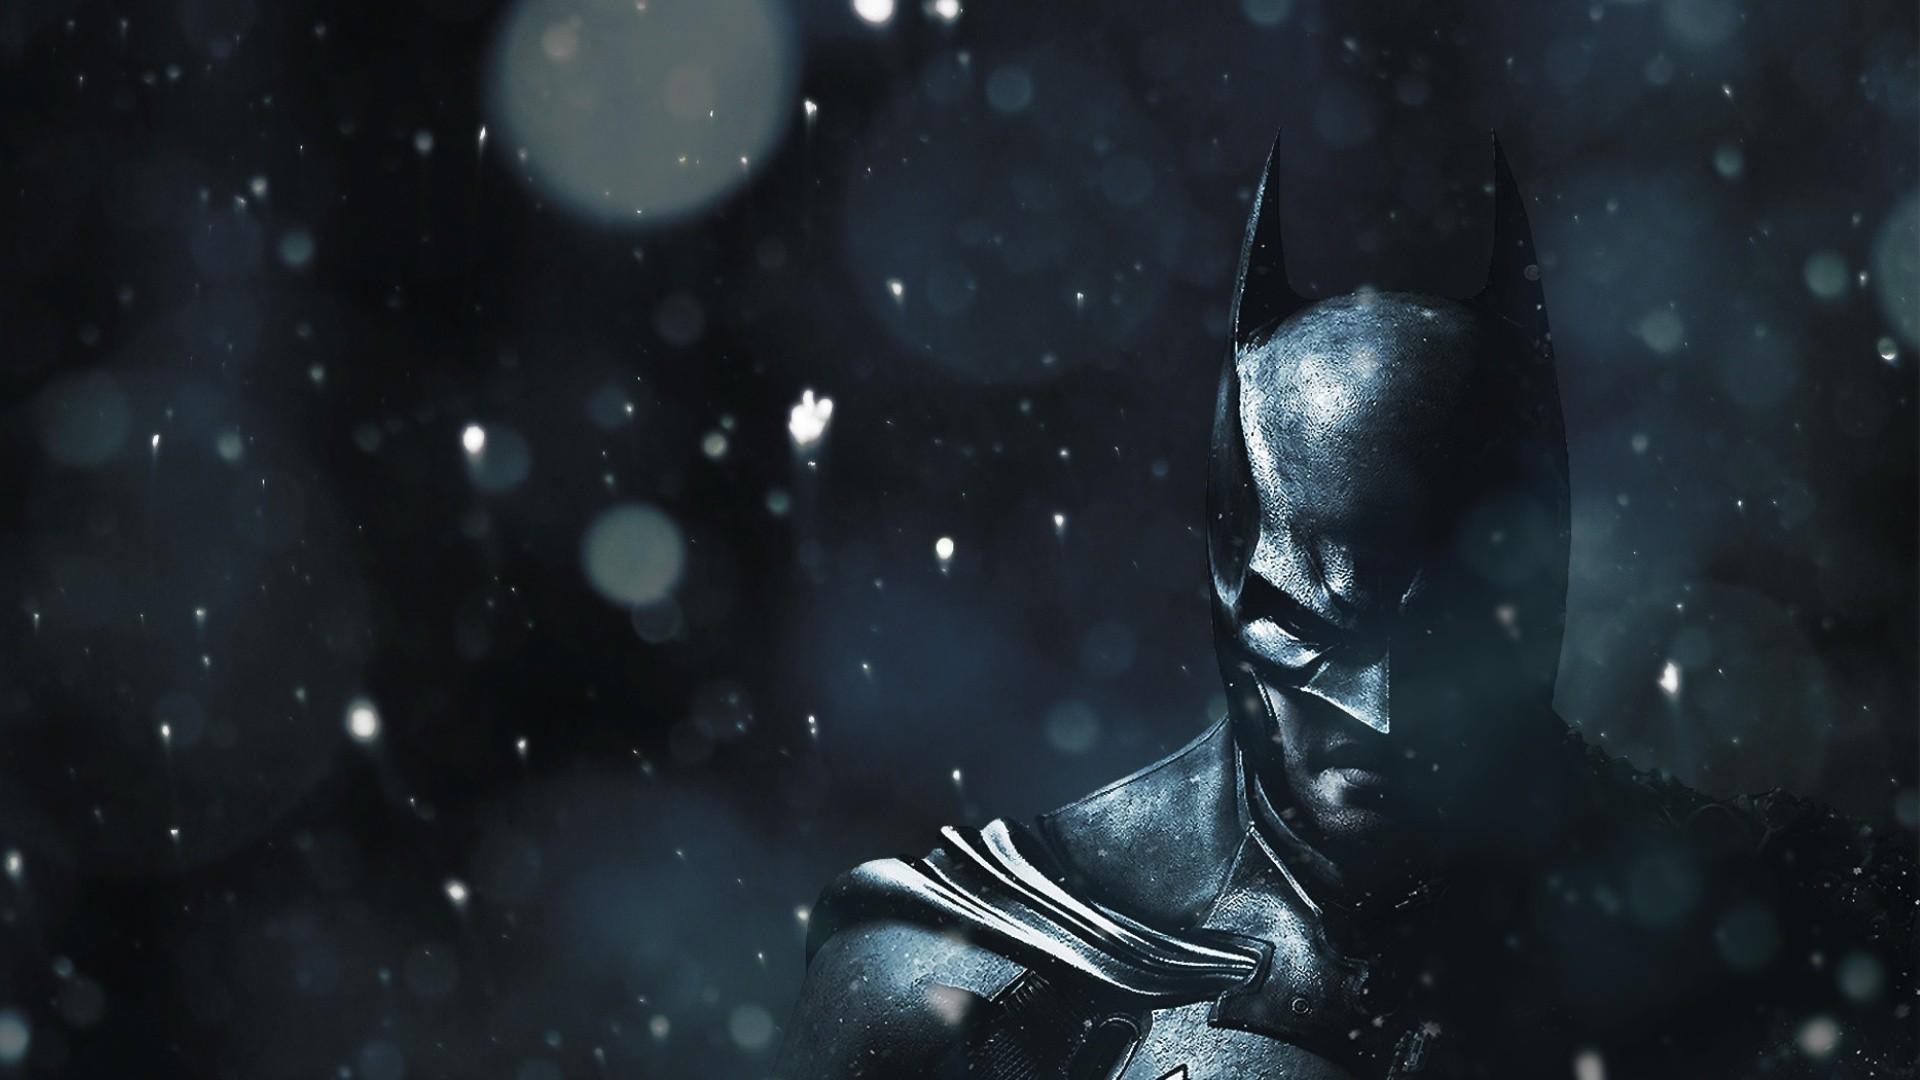 Batman Arkham Origins Game Wallpapers HD Wallpapers 1920x1080